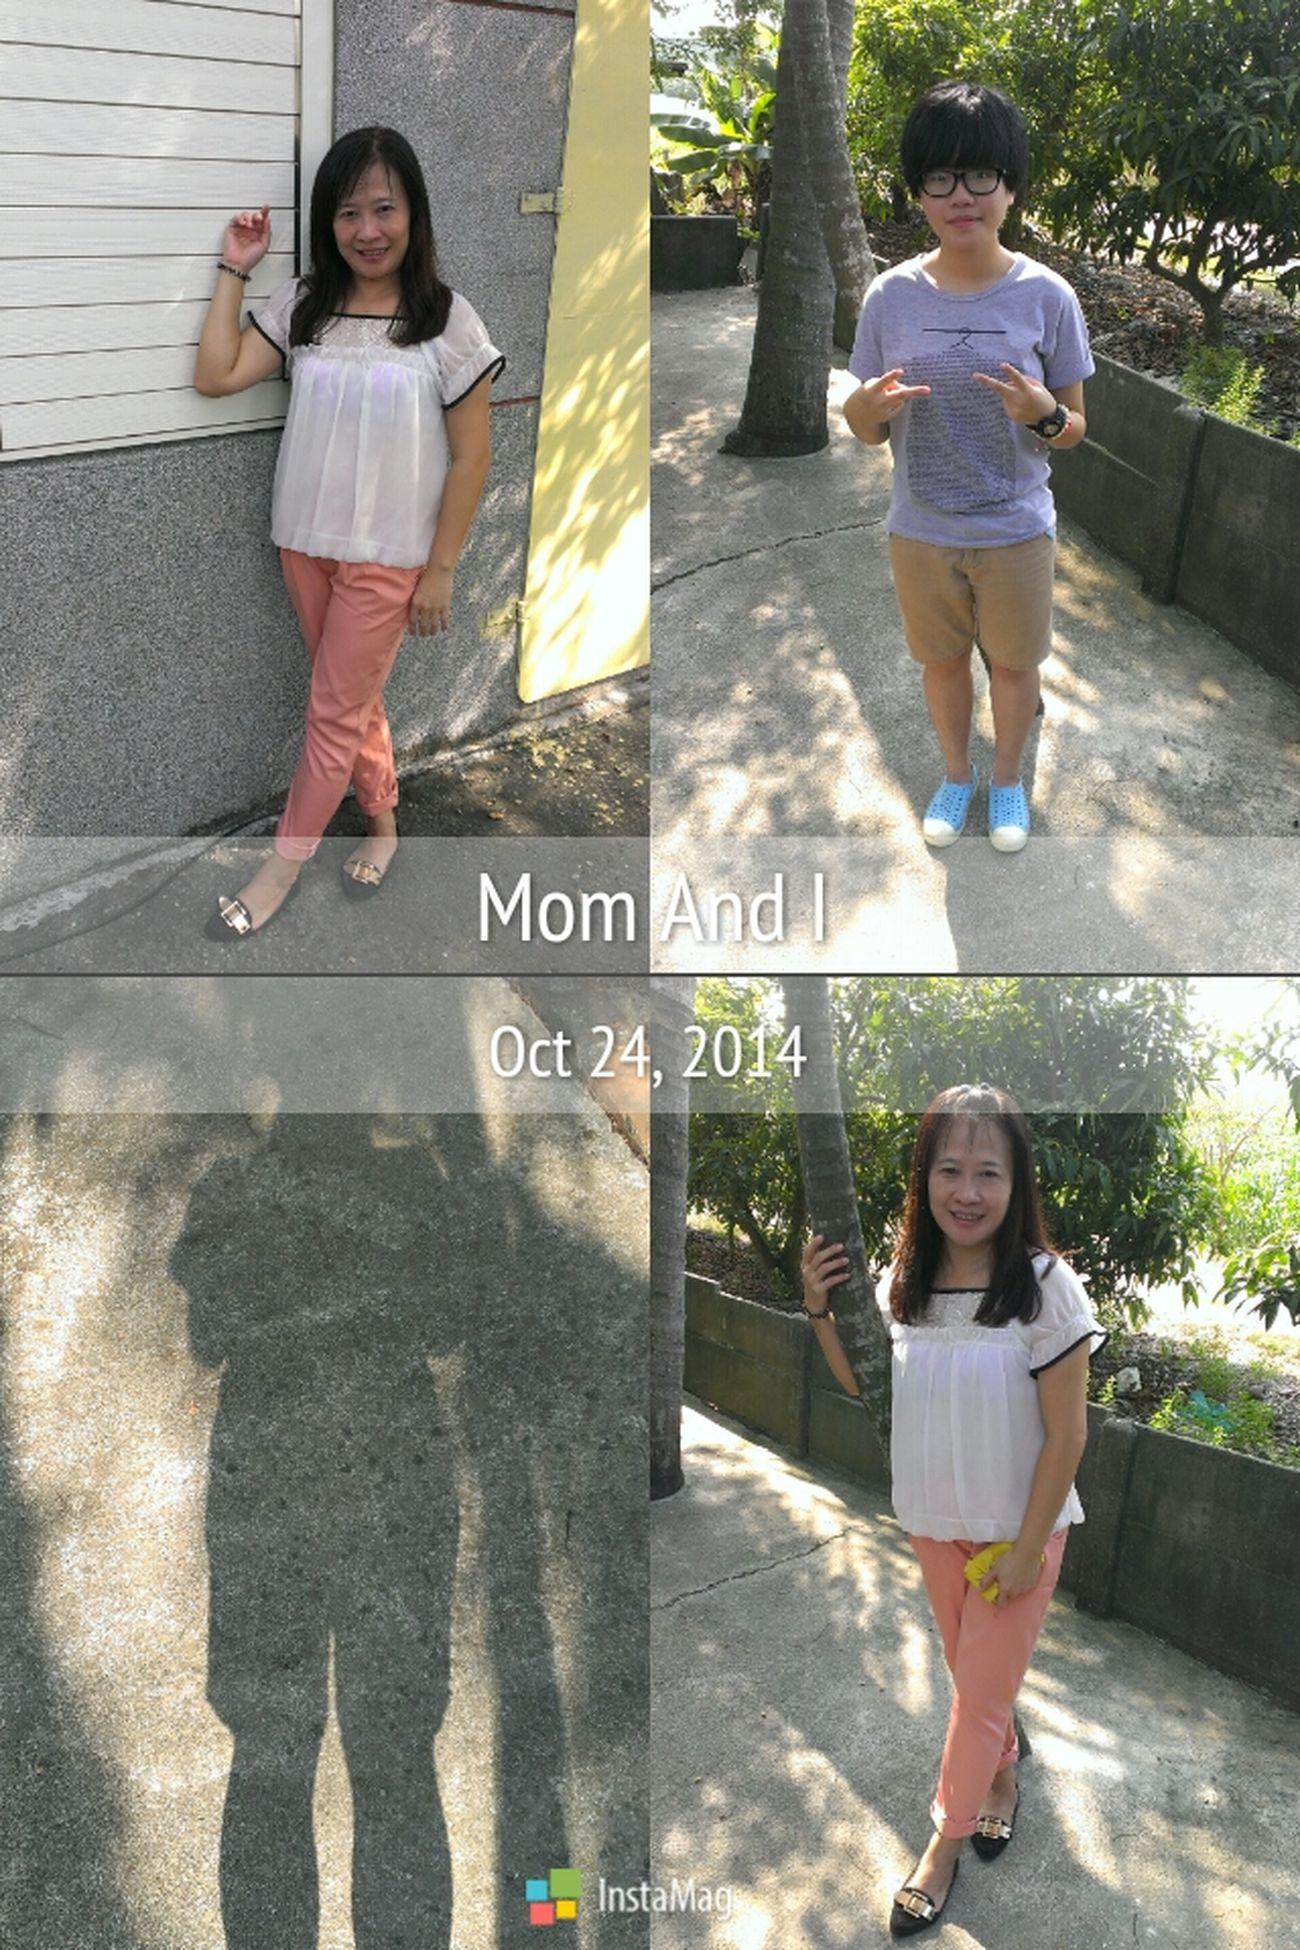 Sun Shiny Day* Backyard My Mom And I